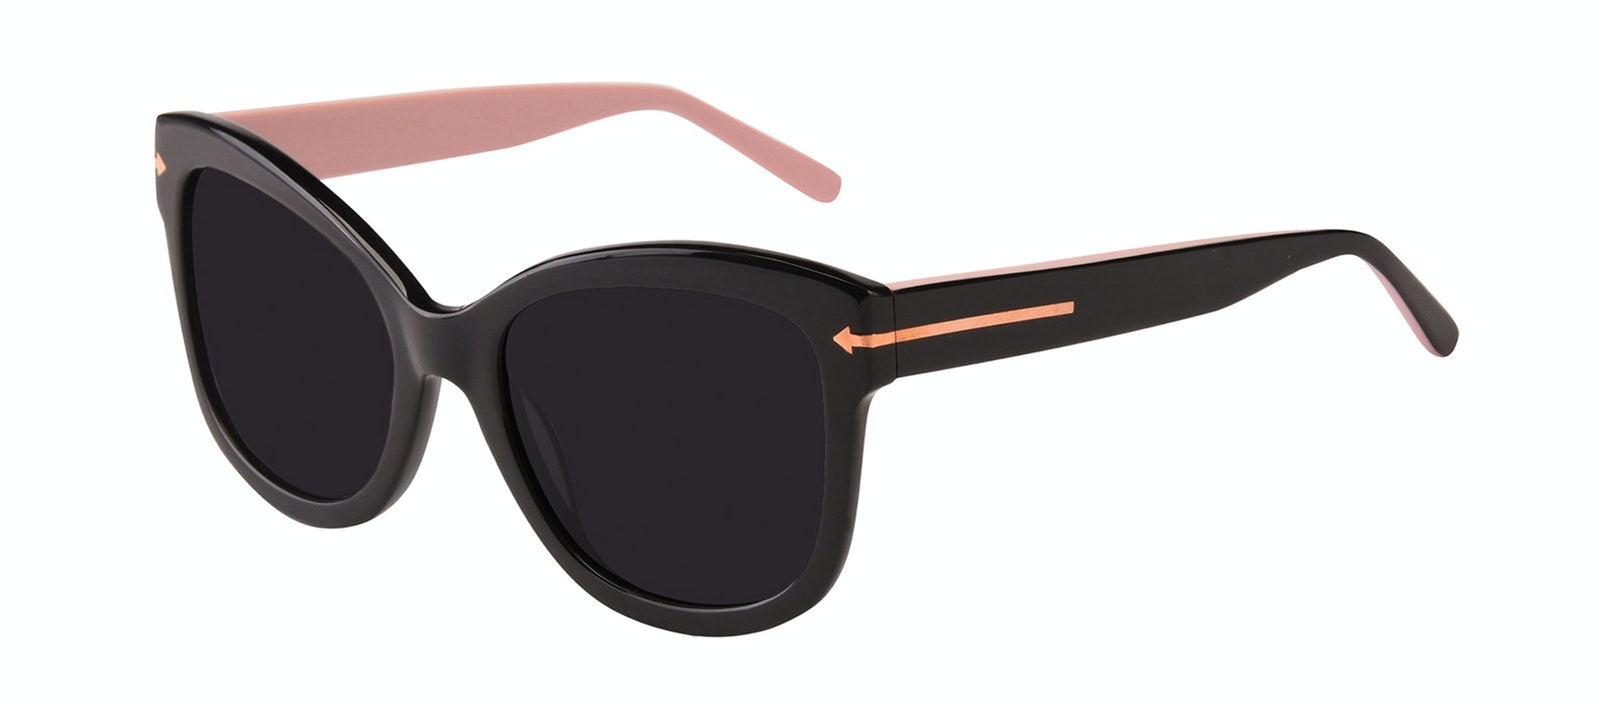 Affordable Fashion Glasses Square Sunglasses Women Marlo Carbon Tilt